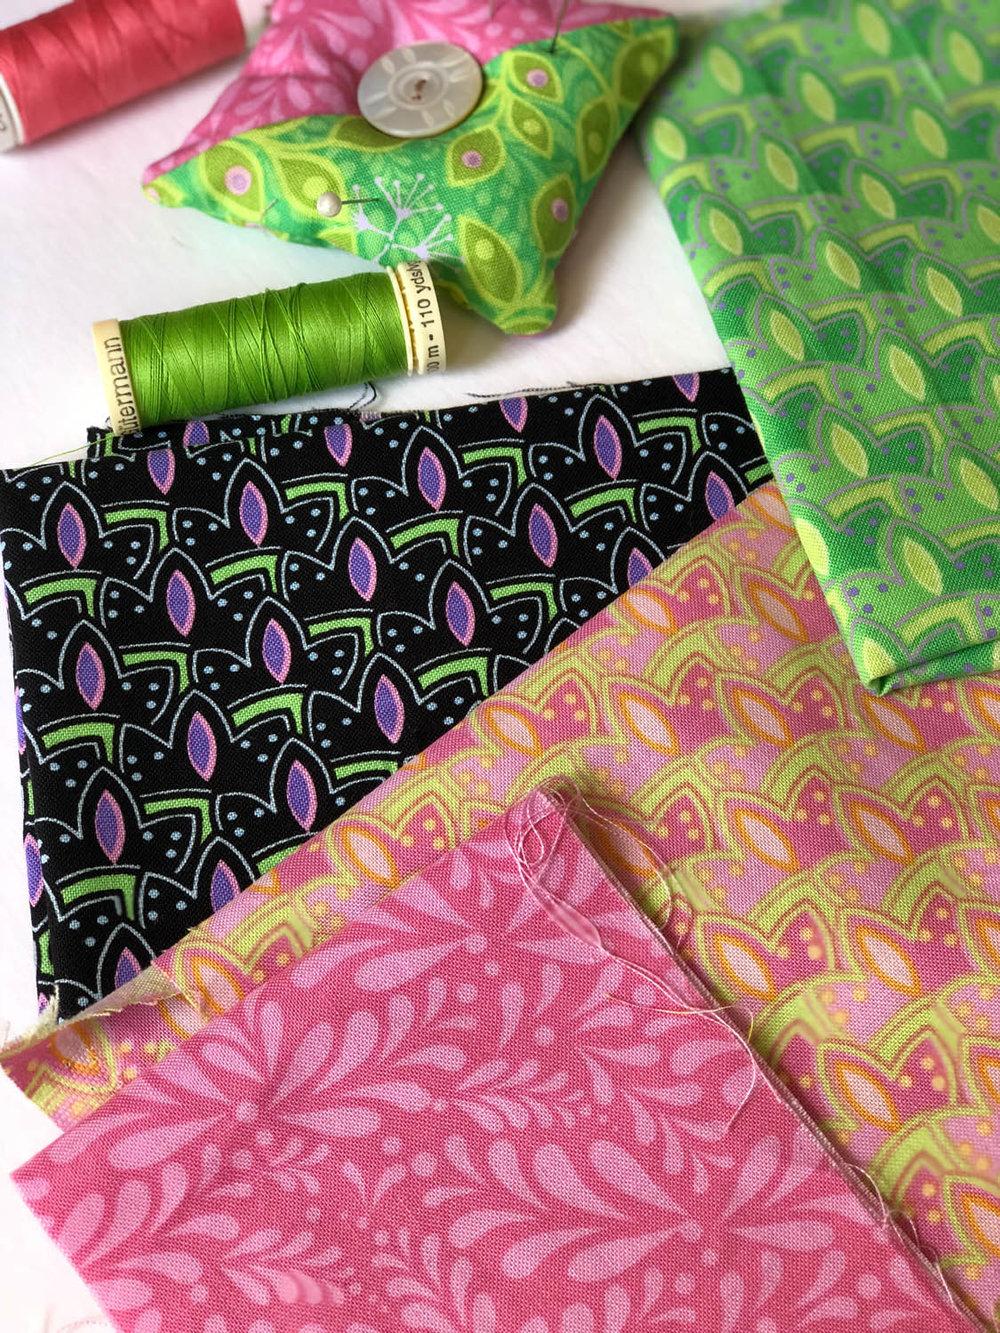 scraps of fabric and quilting thread